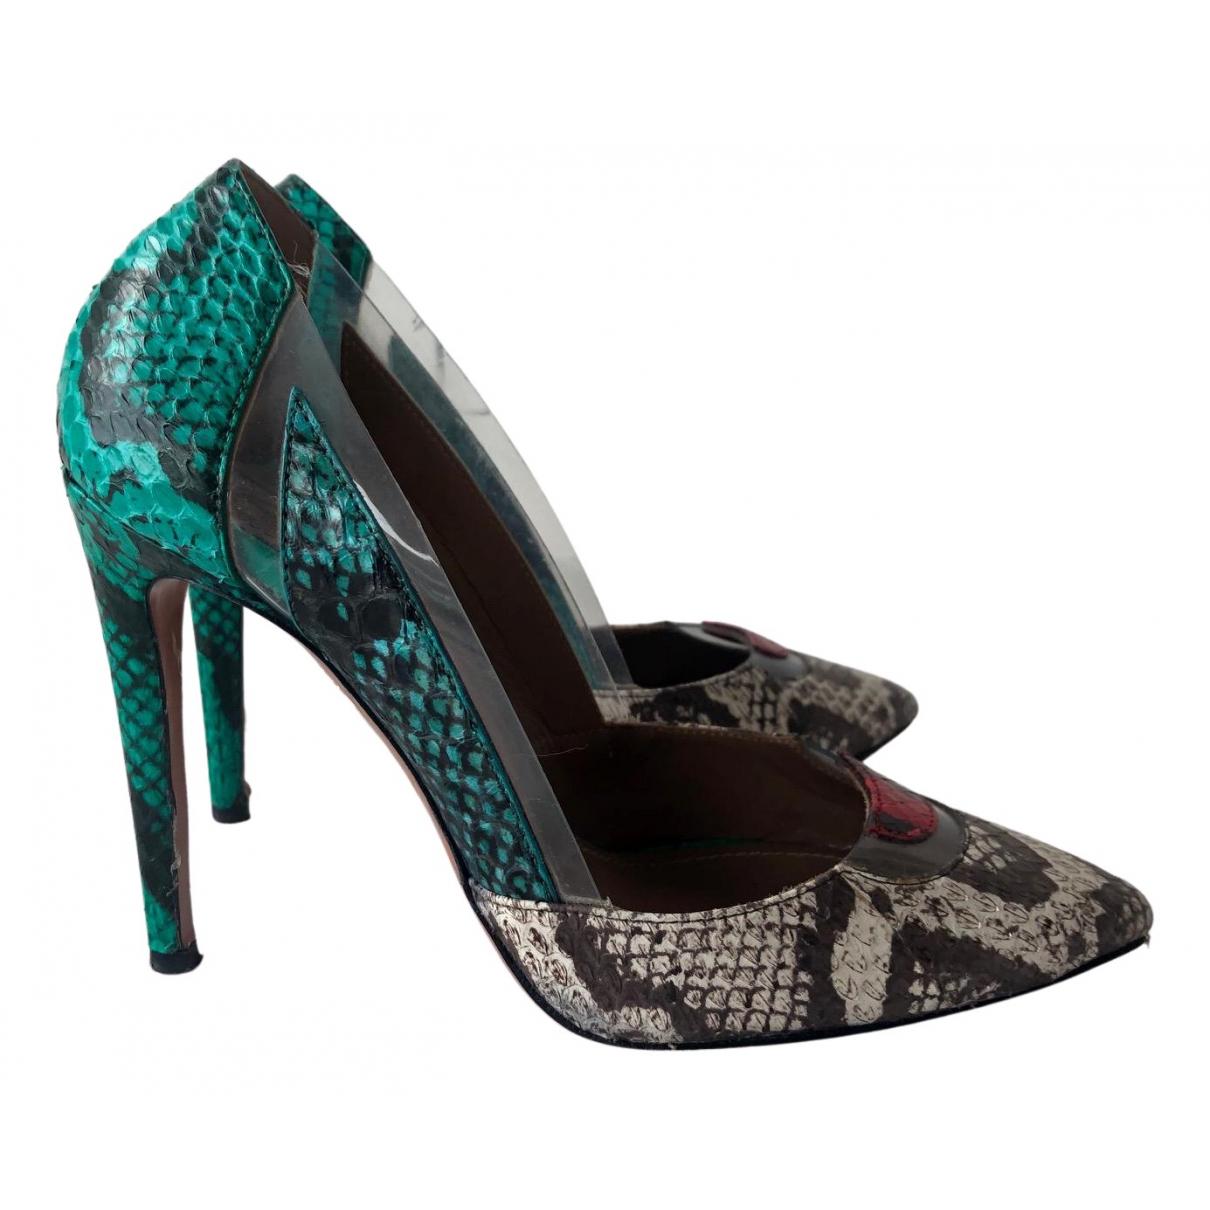 Aquazzura N Multicolour Leather Heels for Women 35 EU